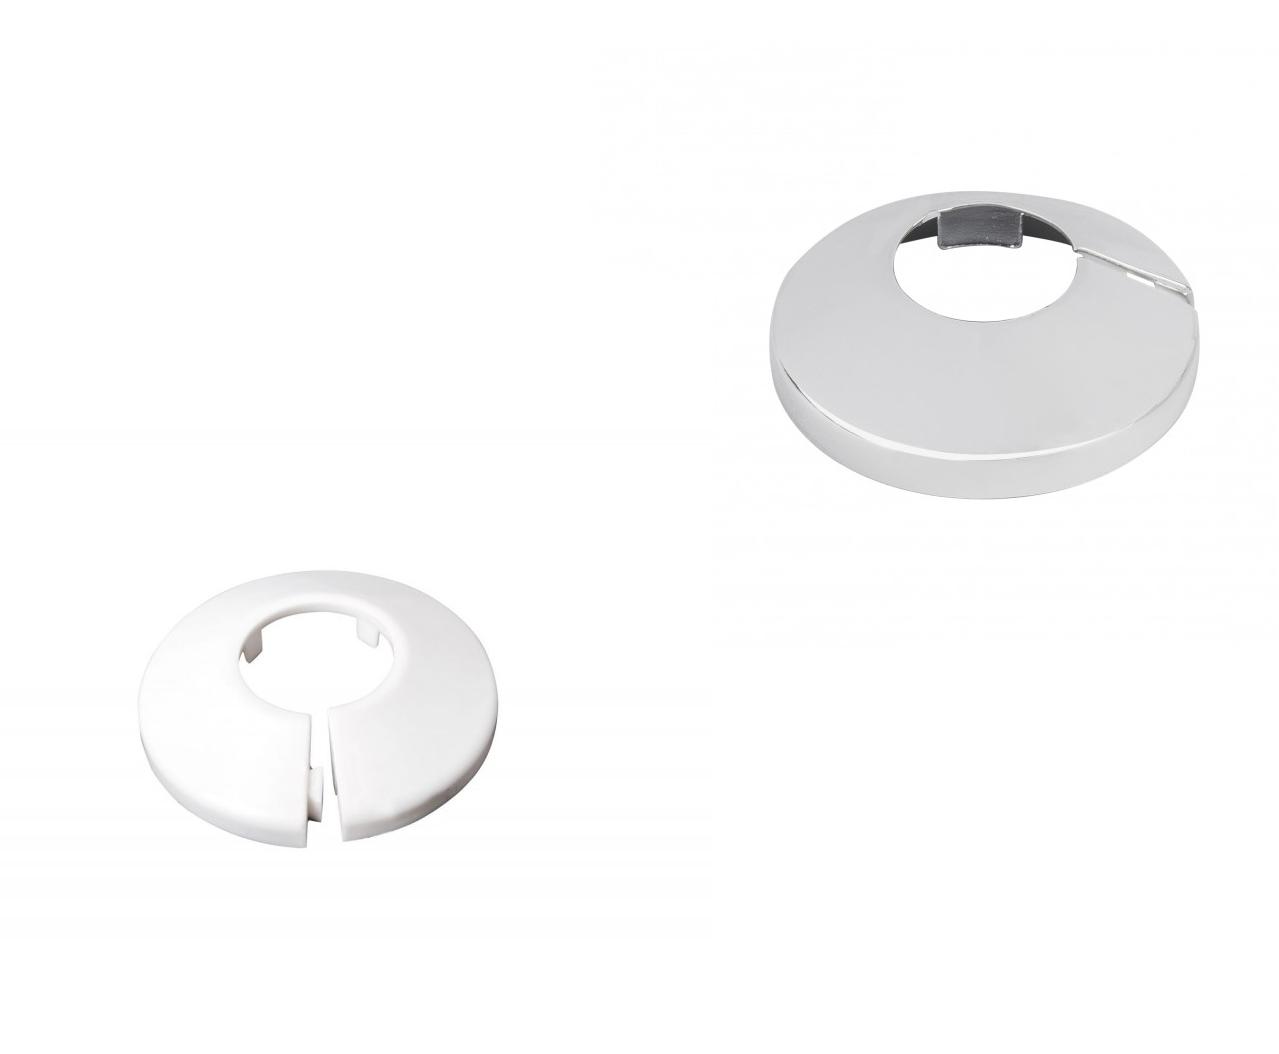 Abdeckrosette Klapprosette Einzeln 15 16 18 20 22 25 28 mm Heizkörper Weiß chrom